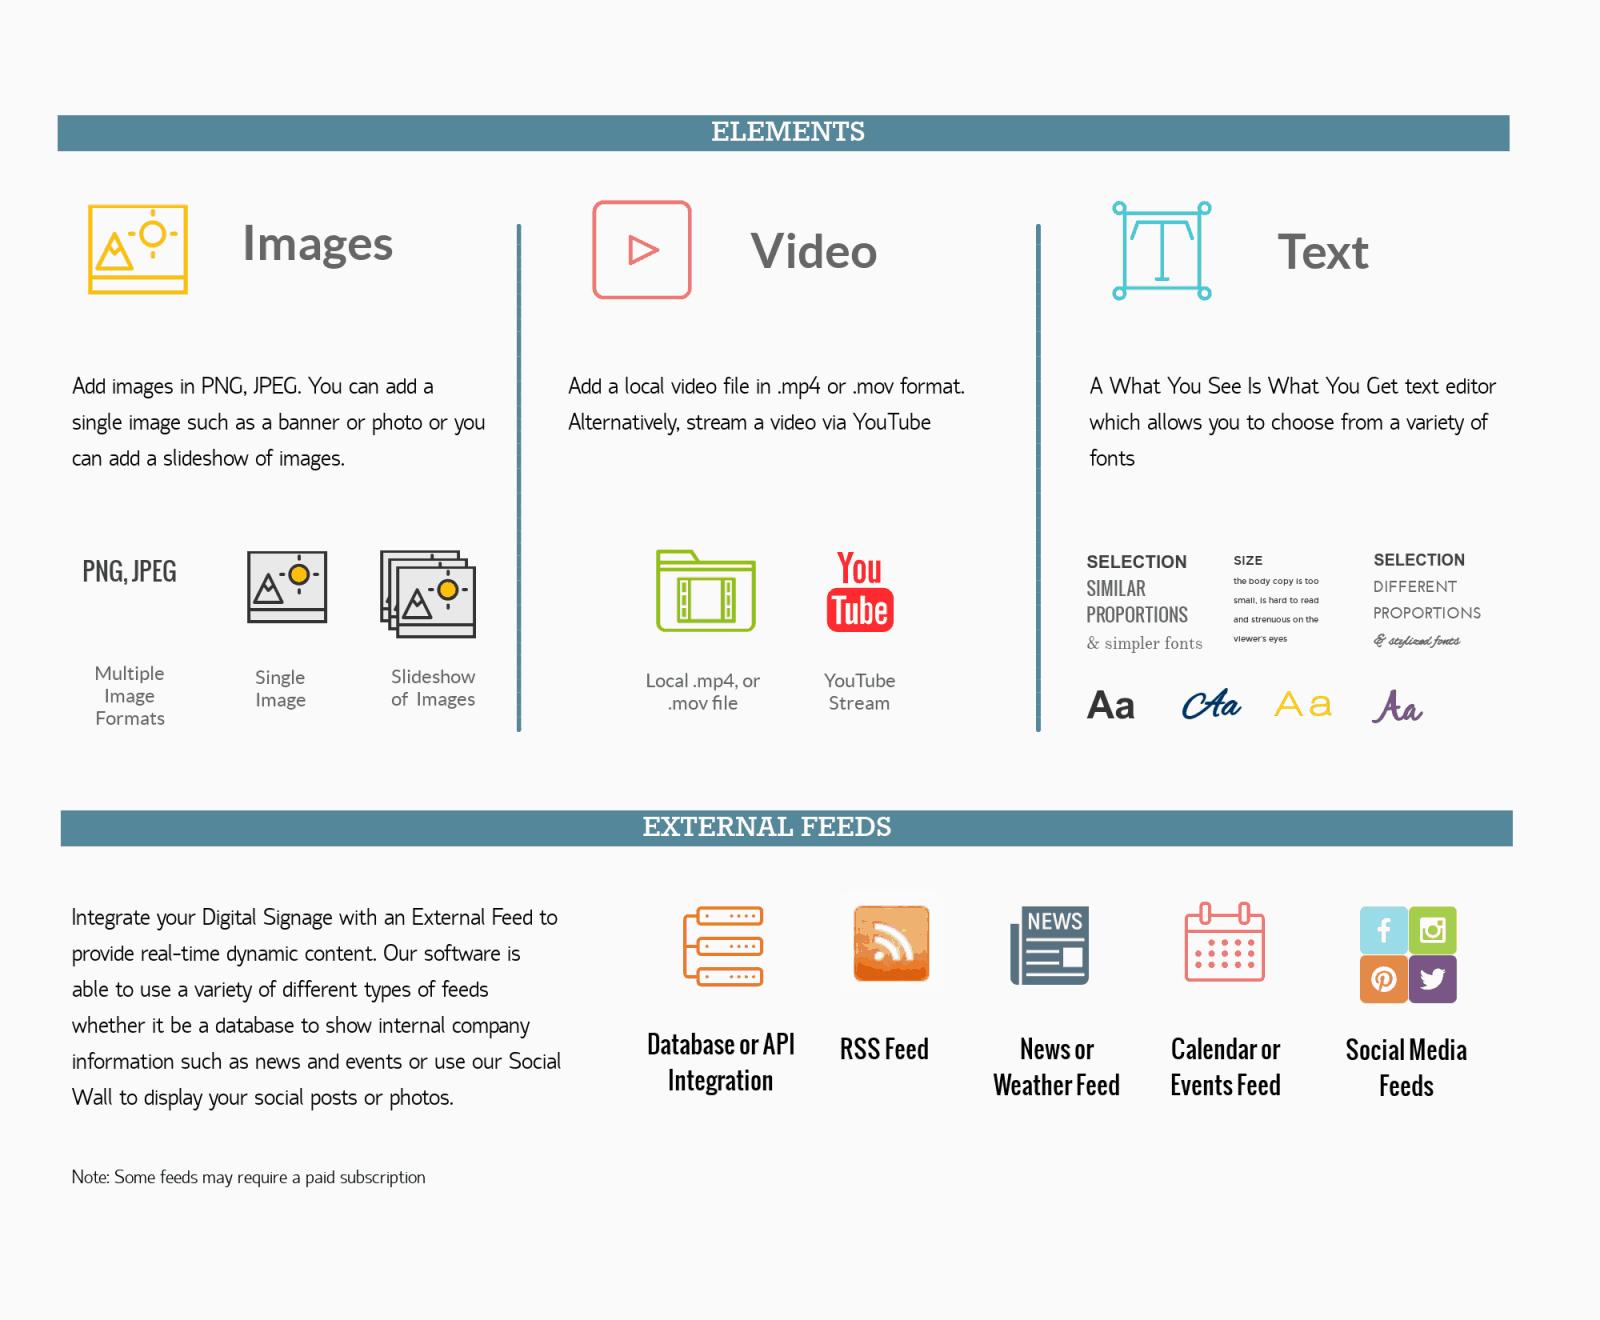 Advertise Me Digital Signage Software overview 3